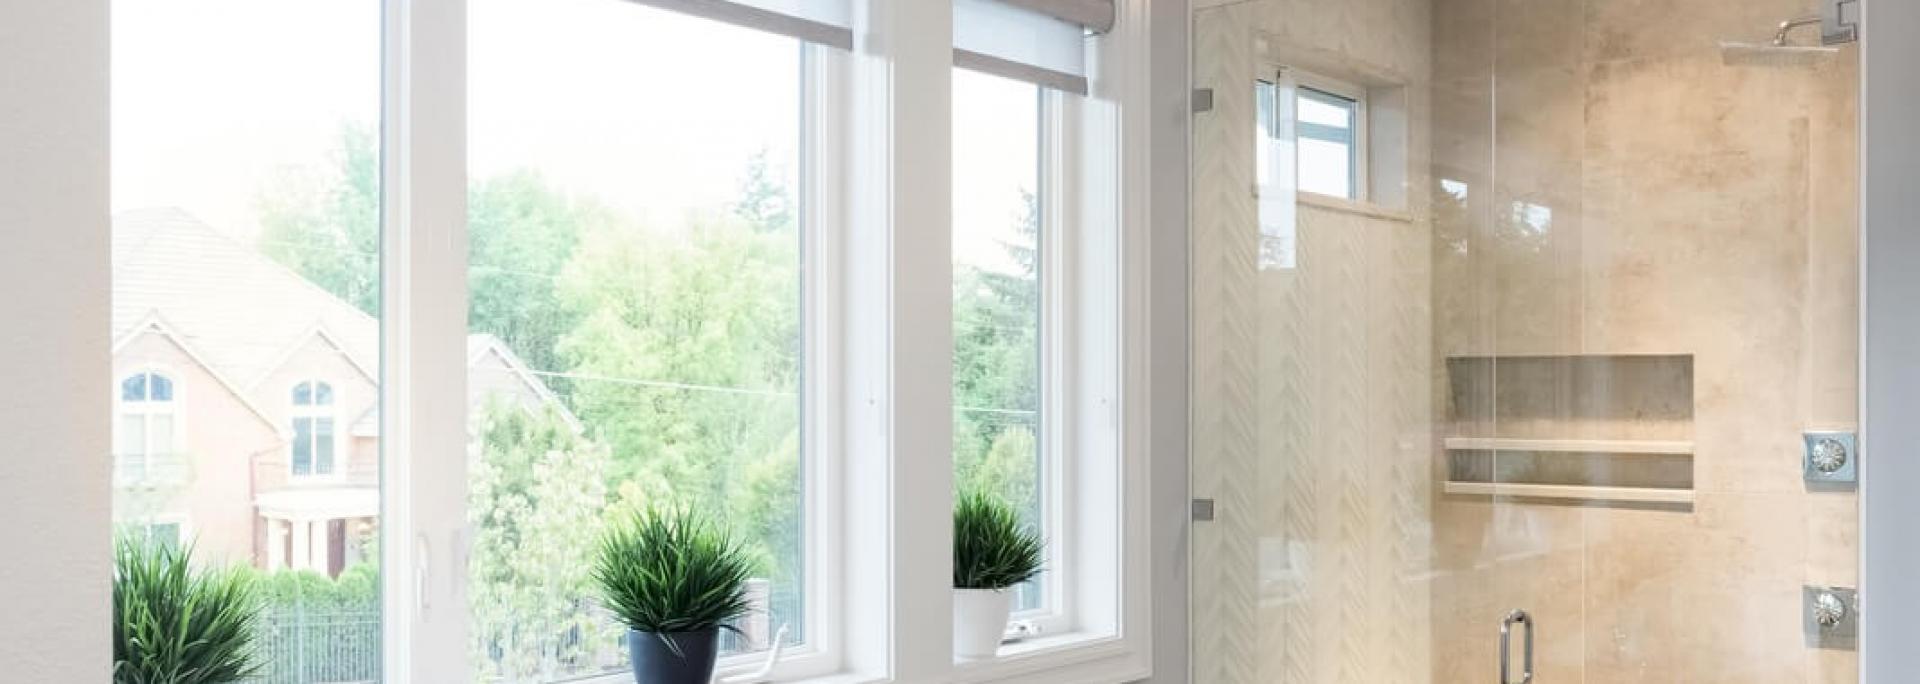 home interior, herringbone tile, large windows